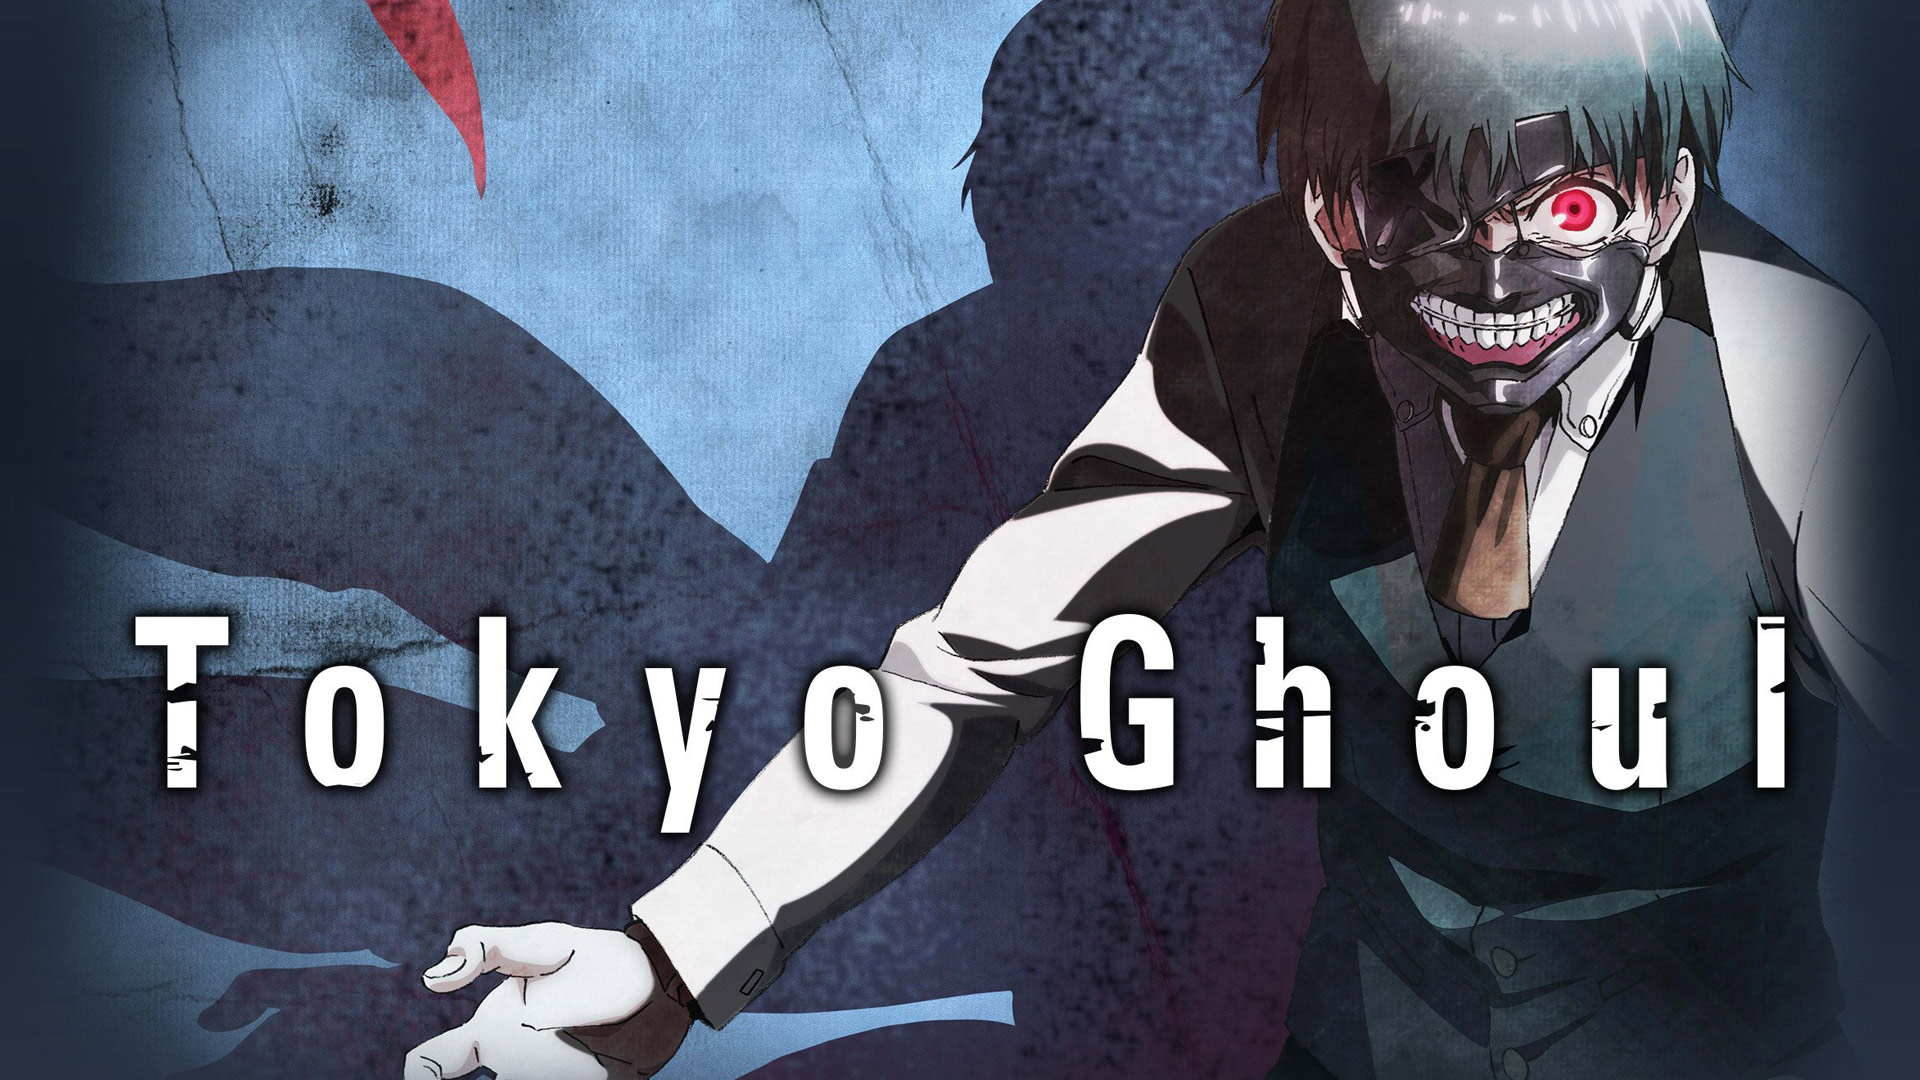 Watch Tokyo Ghoul Original Japanese Version Prime Video